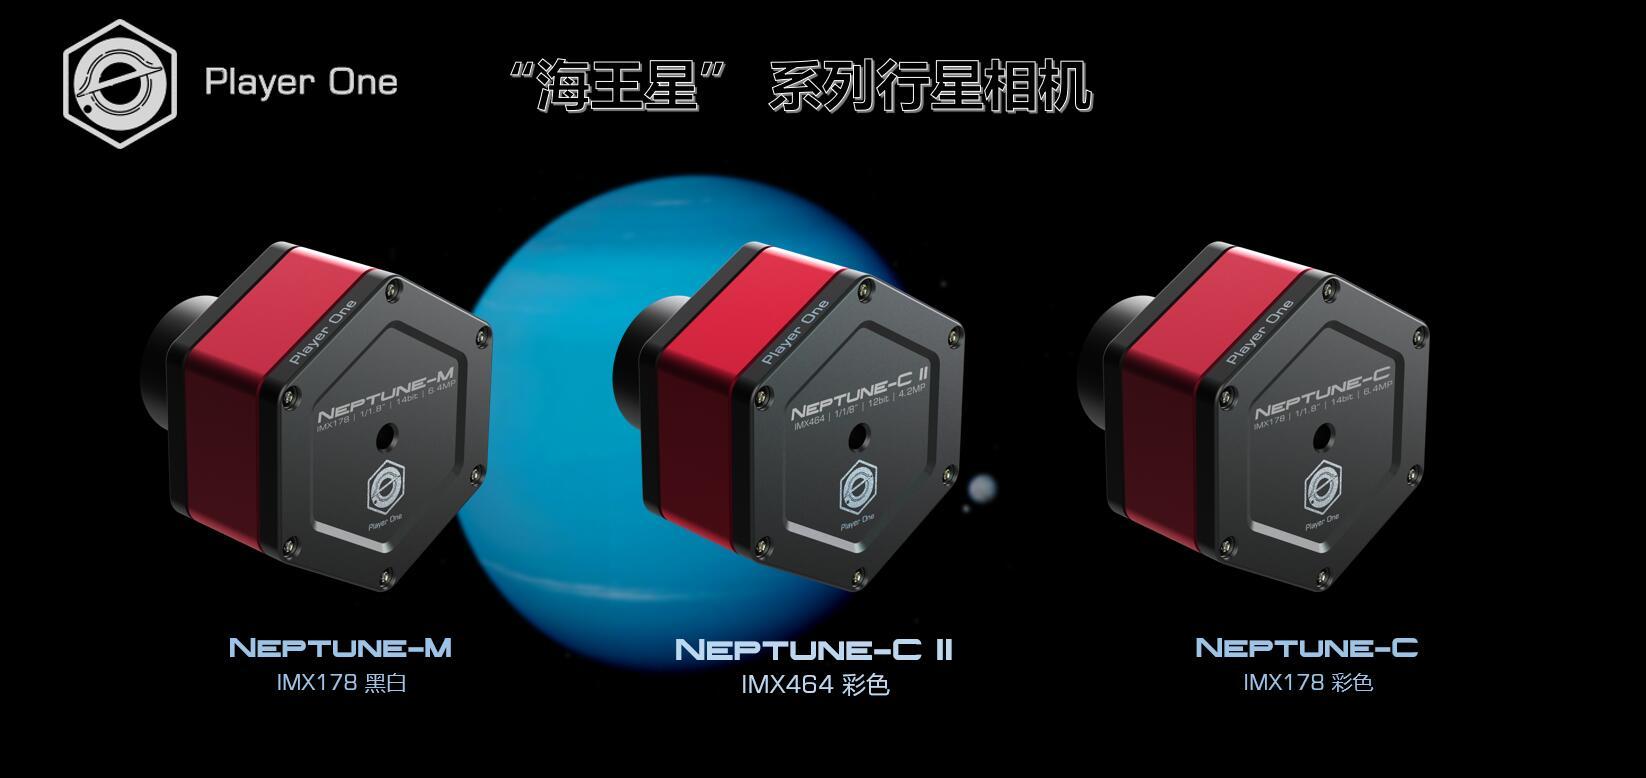 Neptune series.jpg